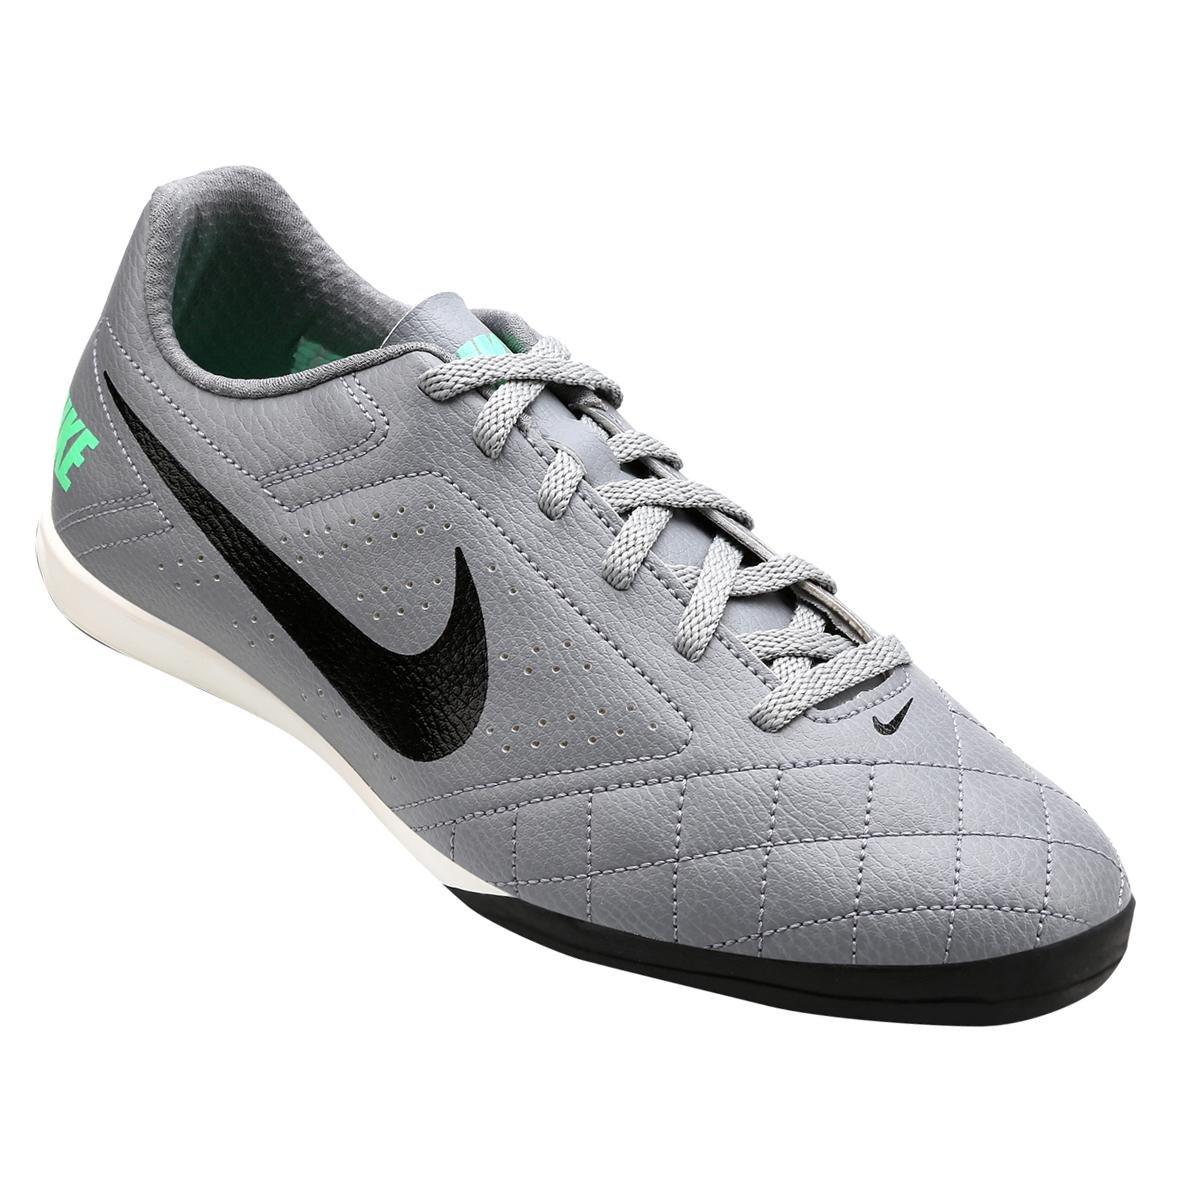 cc8dd33f42 Chuteira Futsal Nike Beco 2 Futsal - Chumbo e Cinza